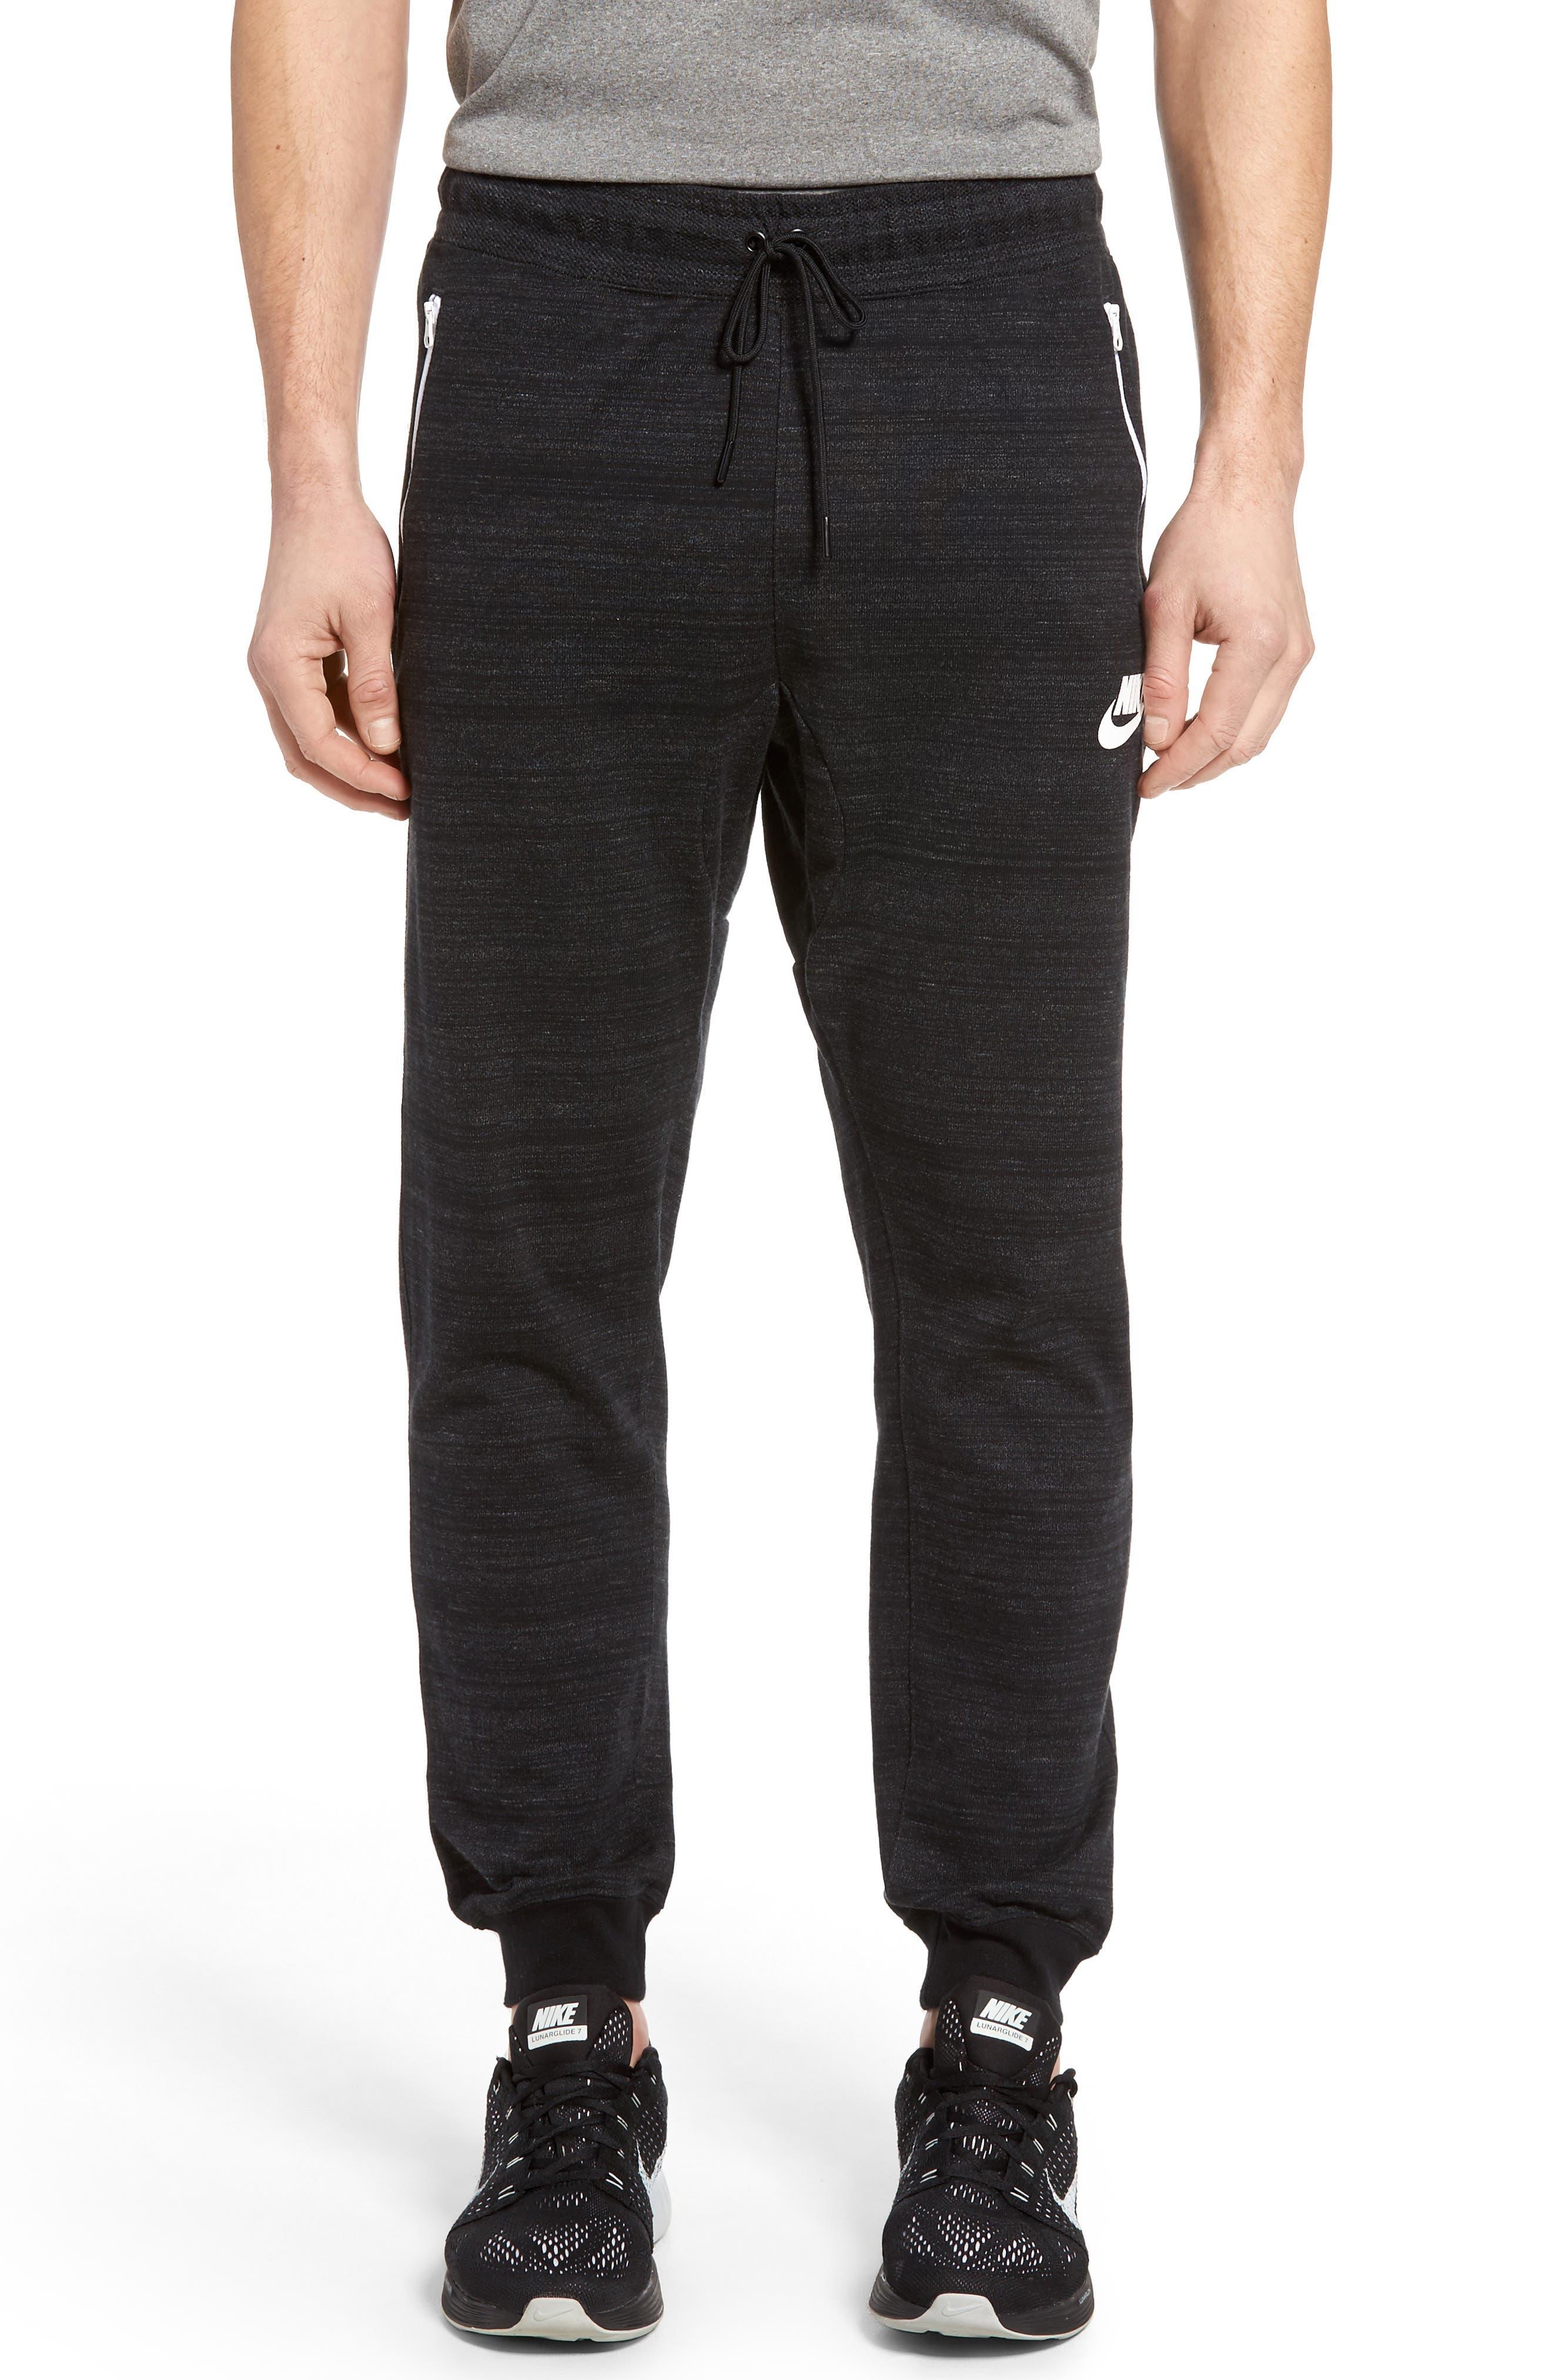 Alternate Image 1 Selected - Nike Advance 15 Pants